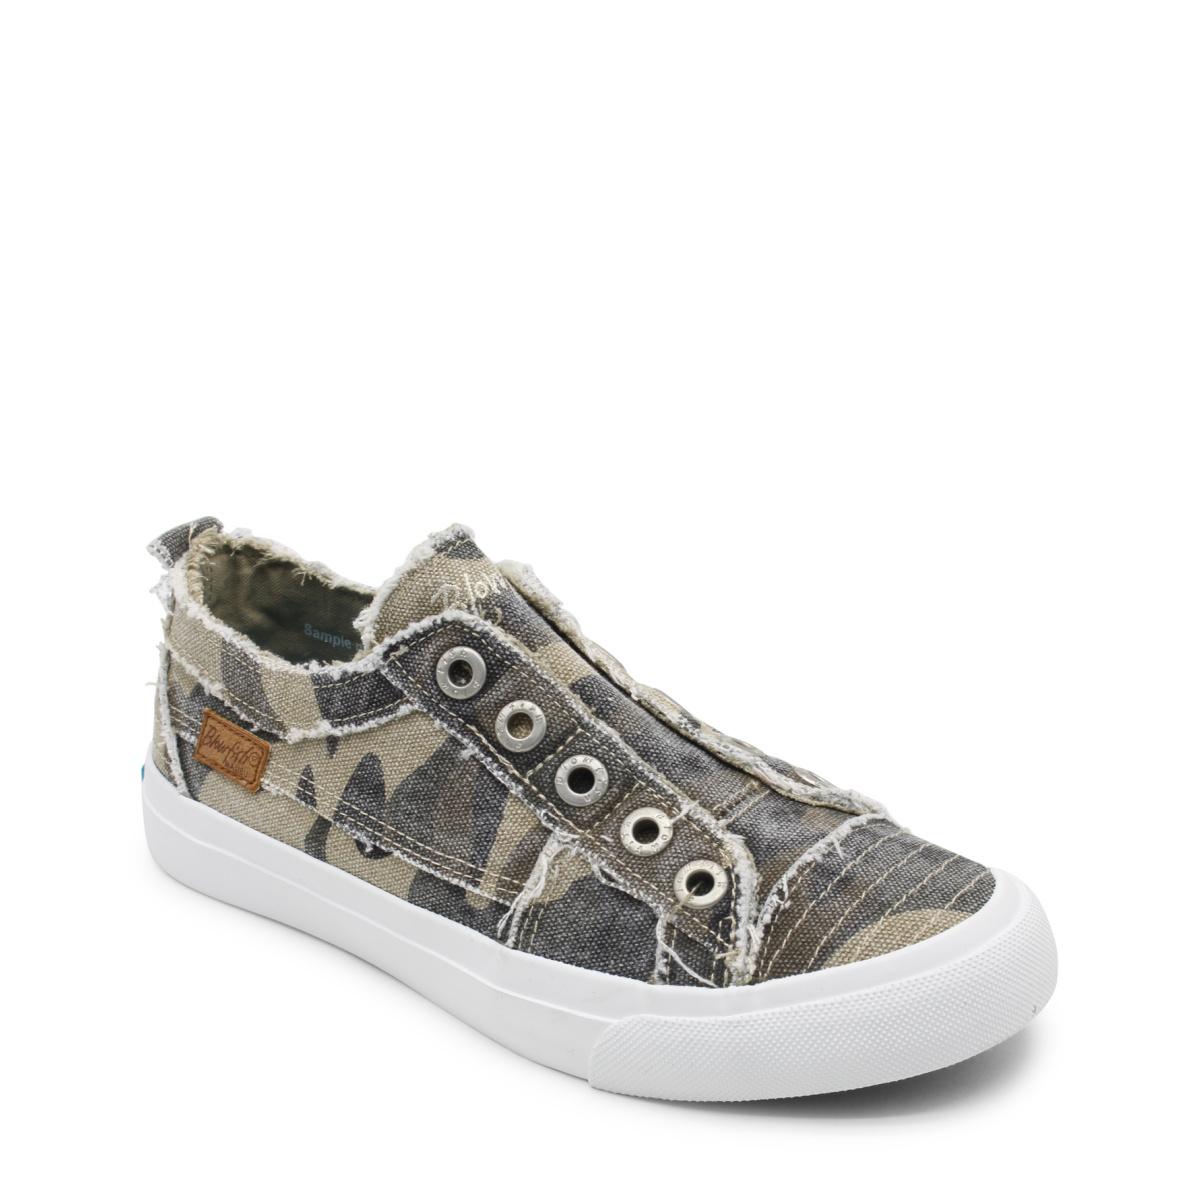 Blowfish Malibu Blowfish Youth/Kids Sneaker Natural Camo